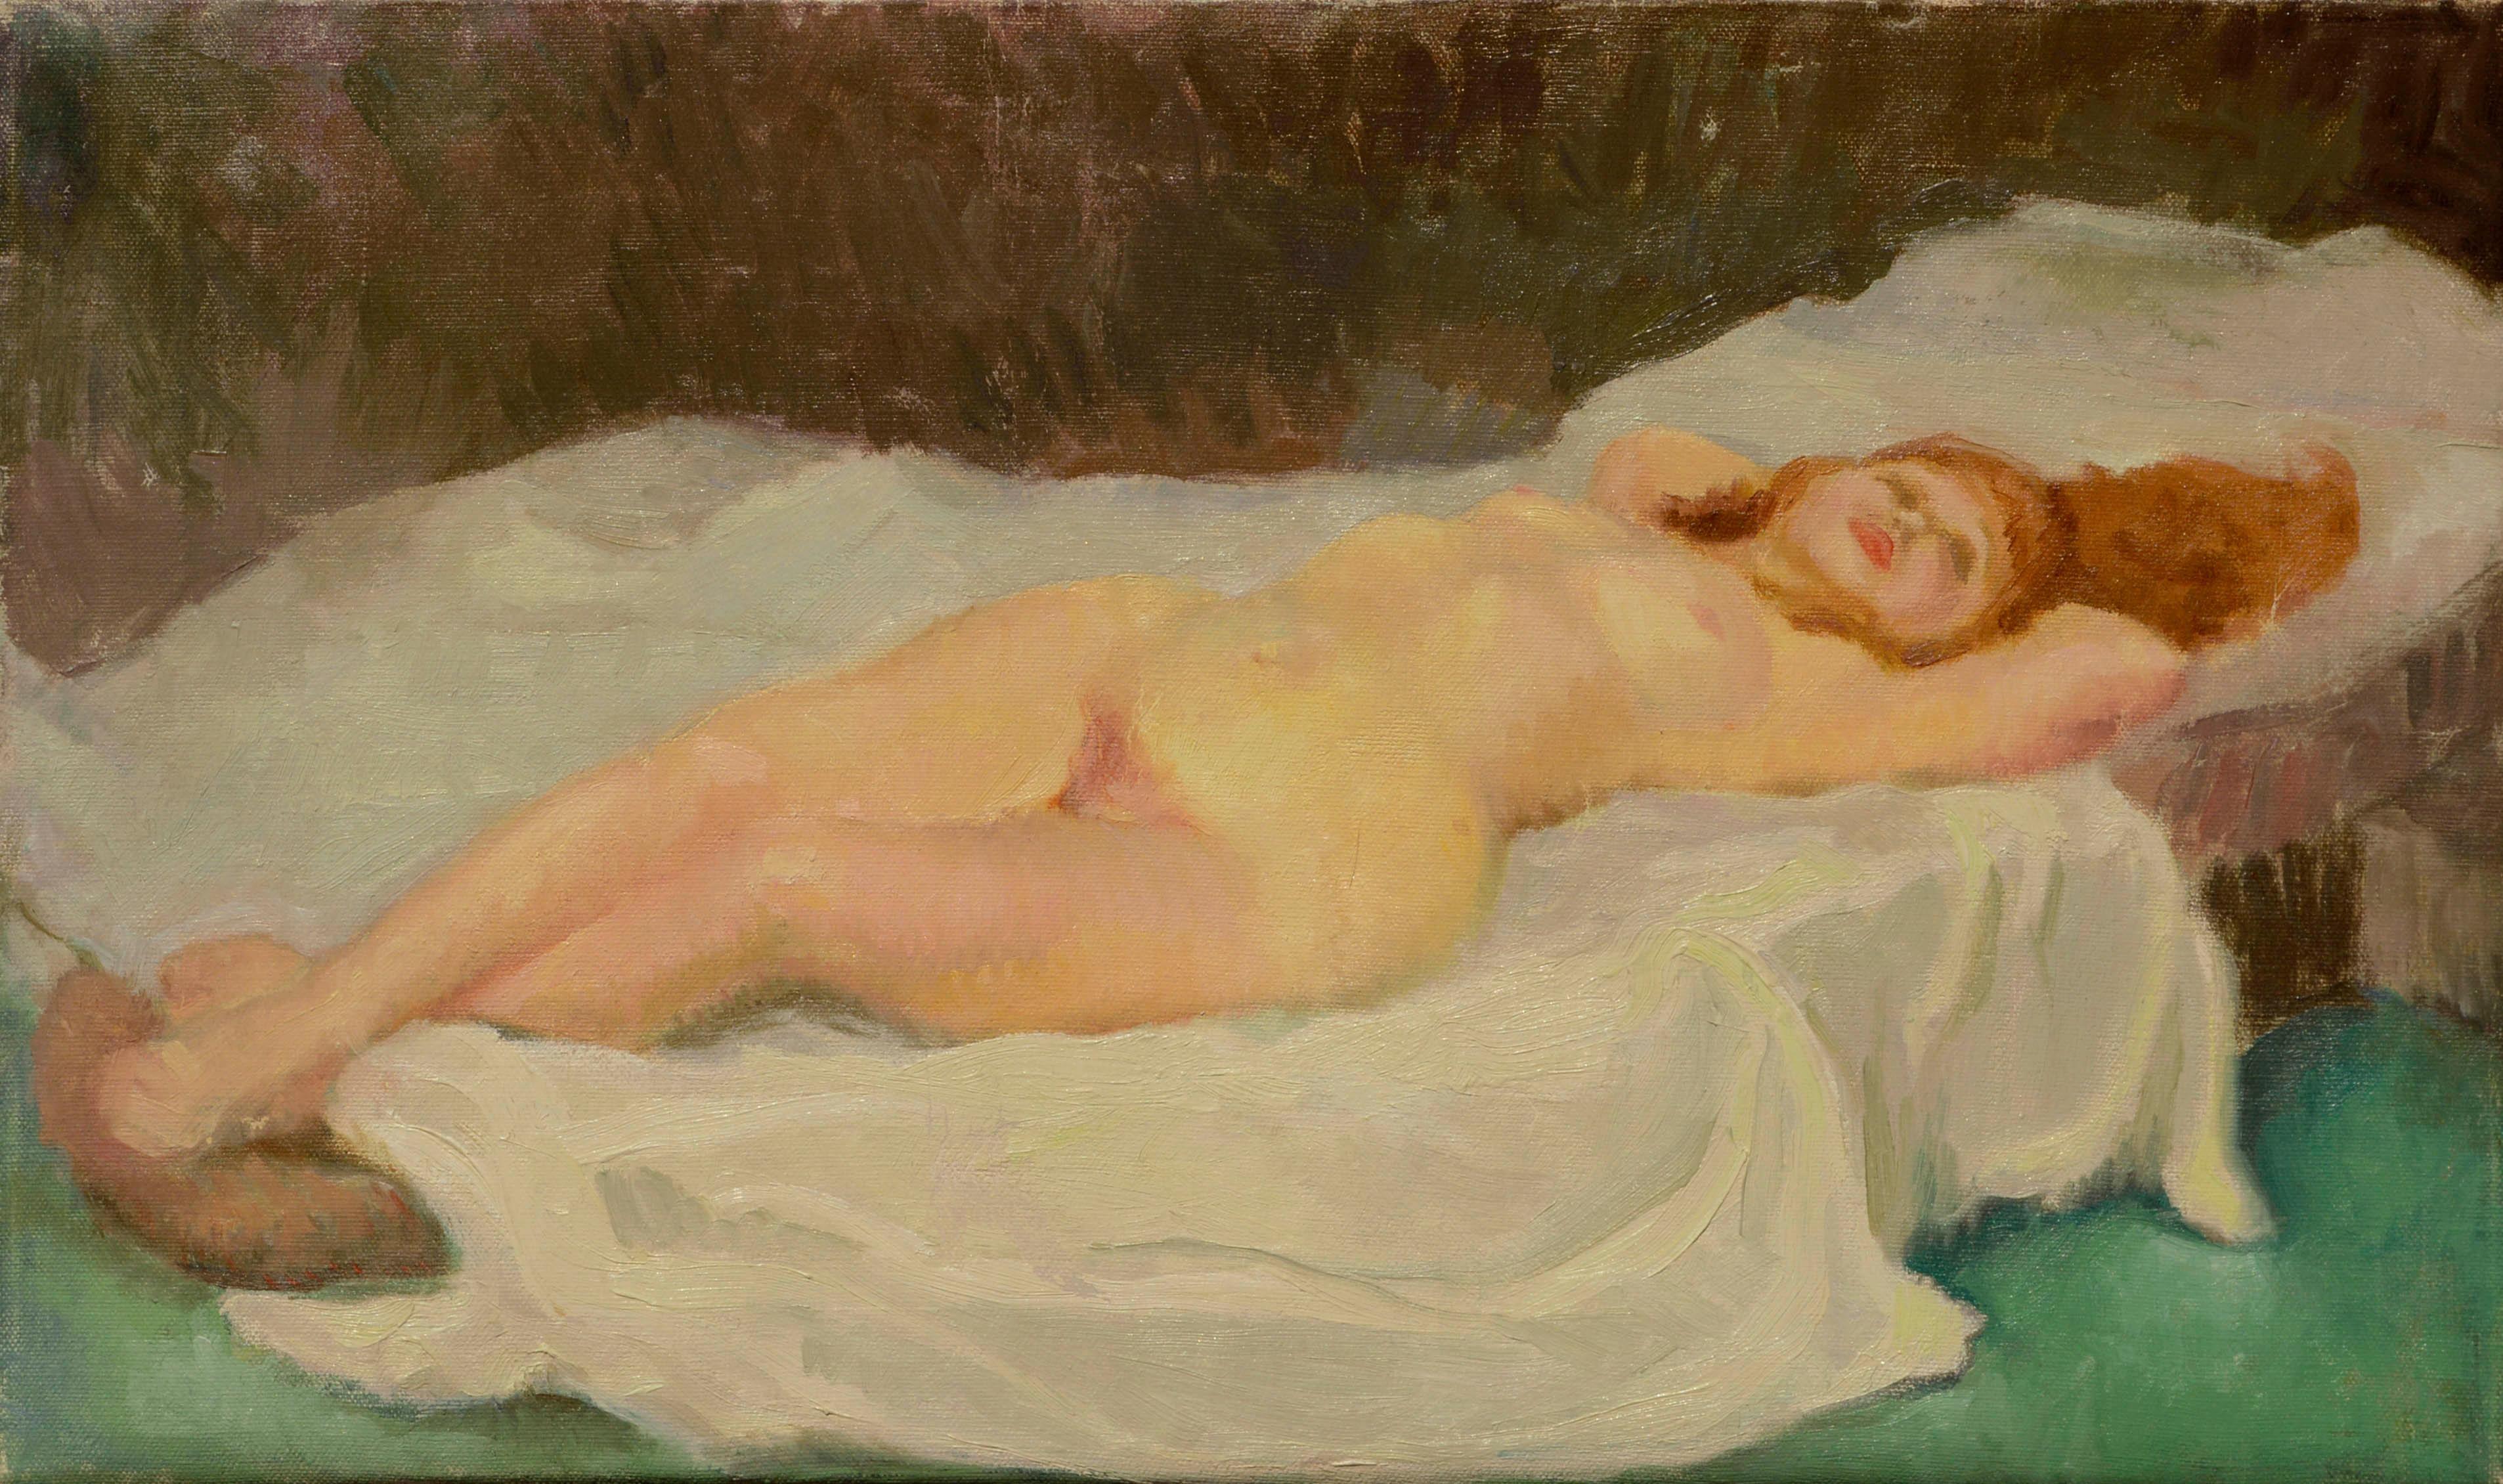 Reclining Female Nude Figure